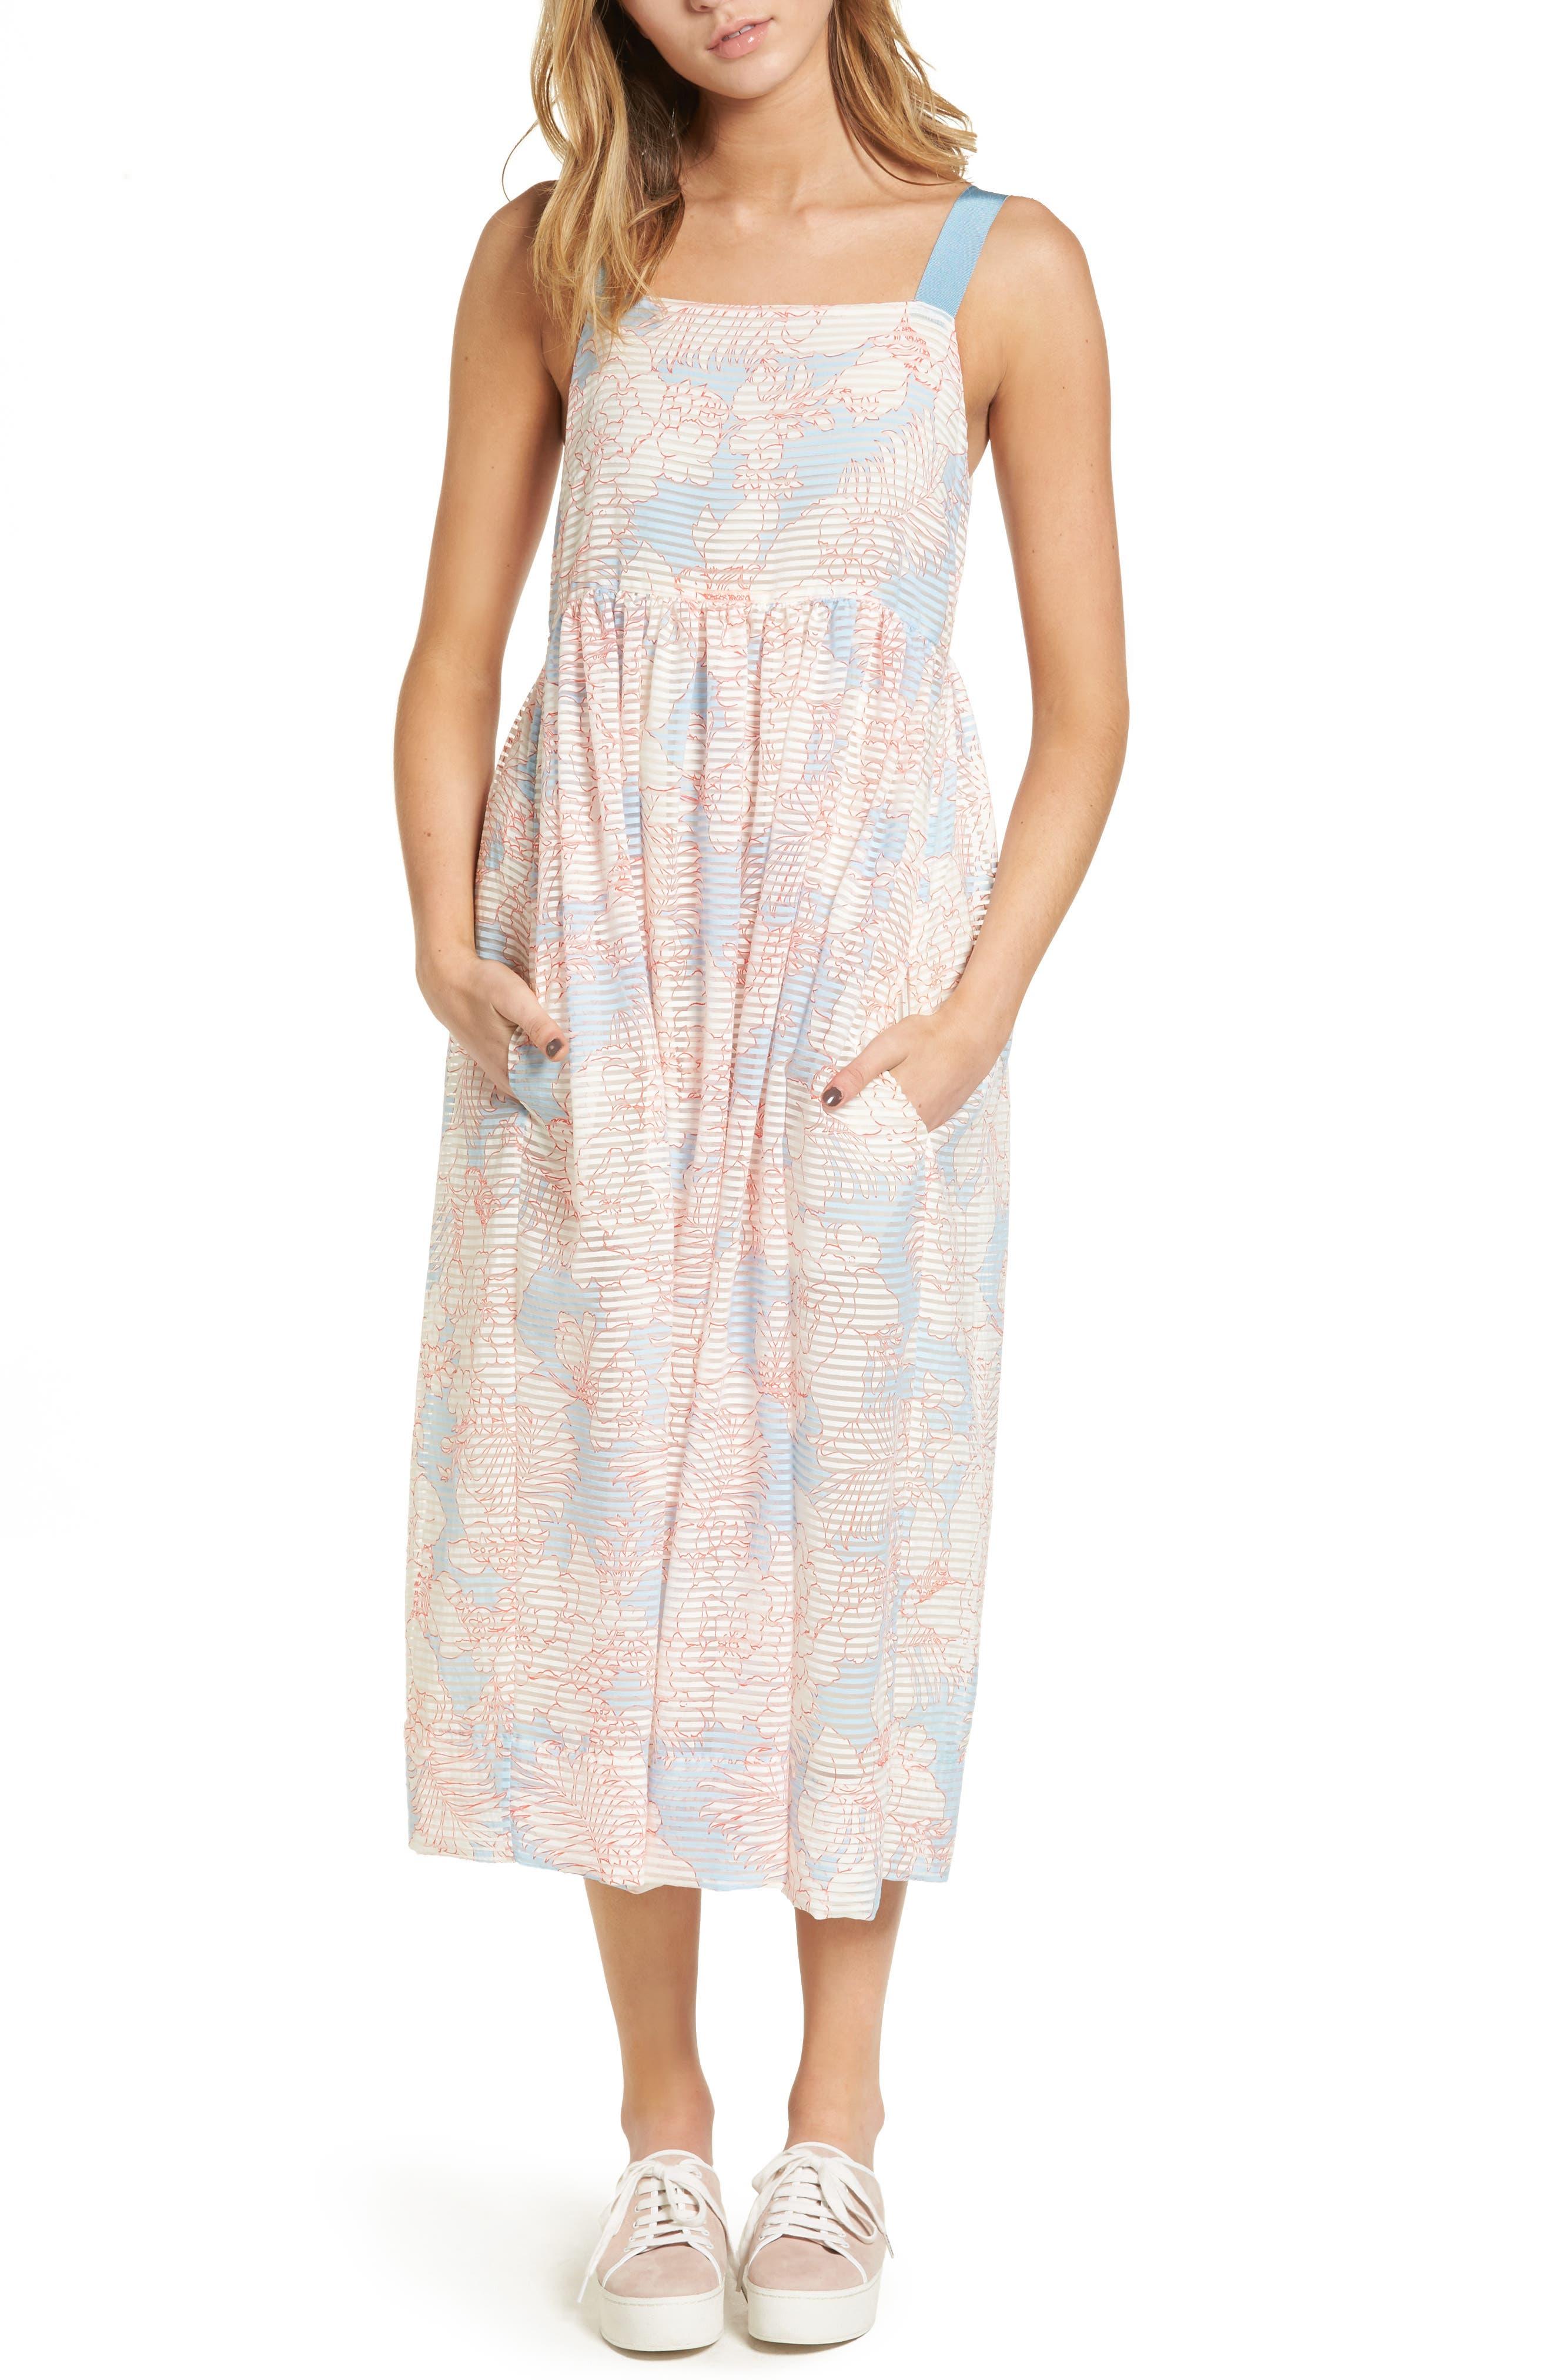 Bahamas Print Midi Dress,                             Main thumbnail 1, color,                             400